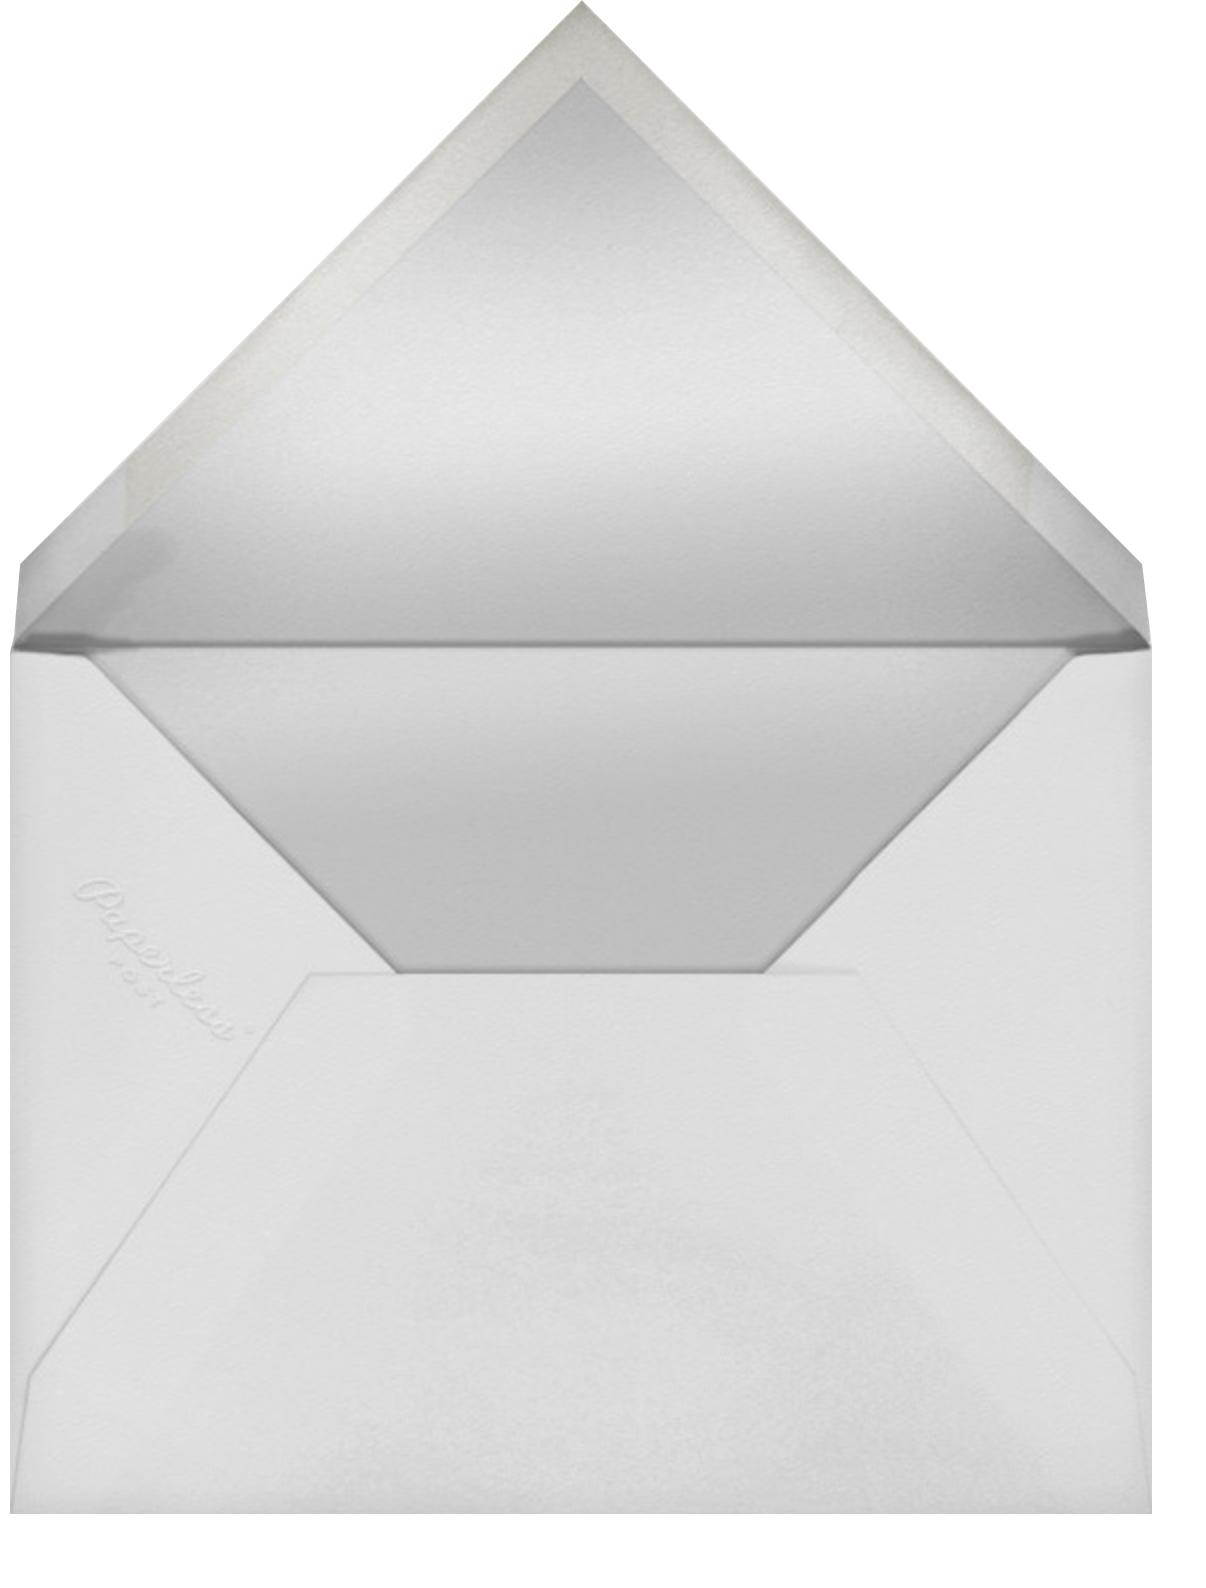 No Two Alike - Caribbean - Paperless Post - Baby shower - envelope back